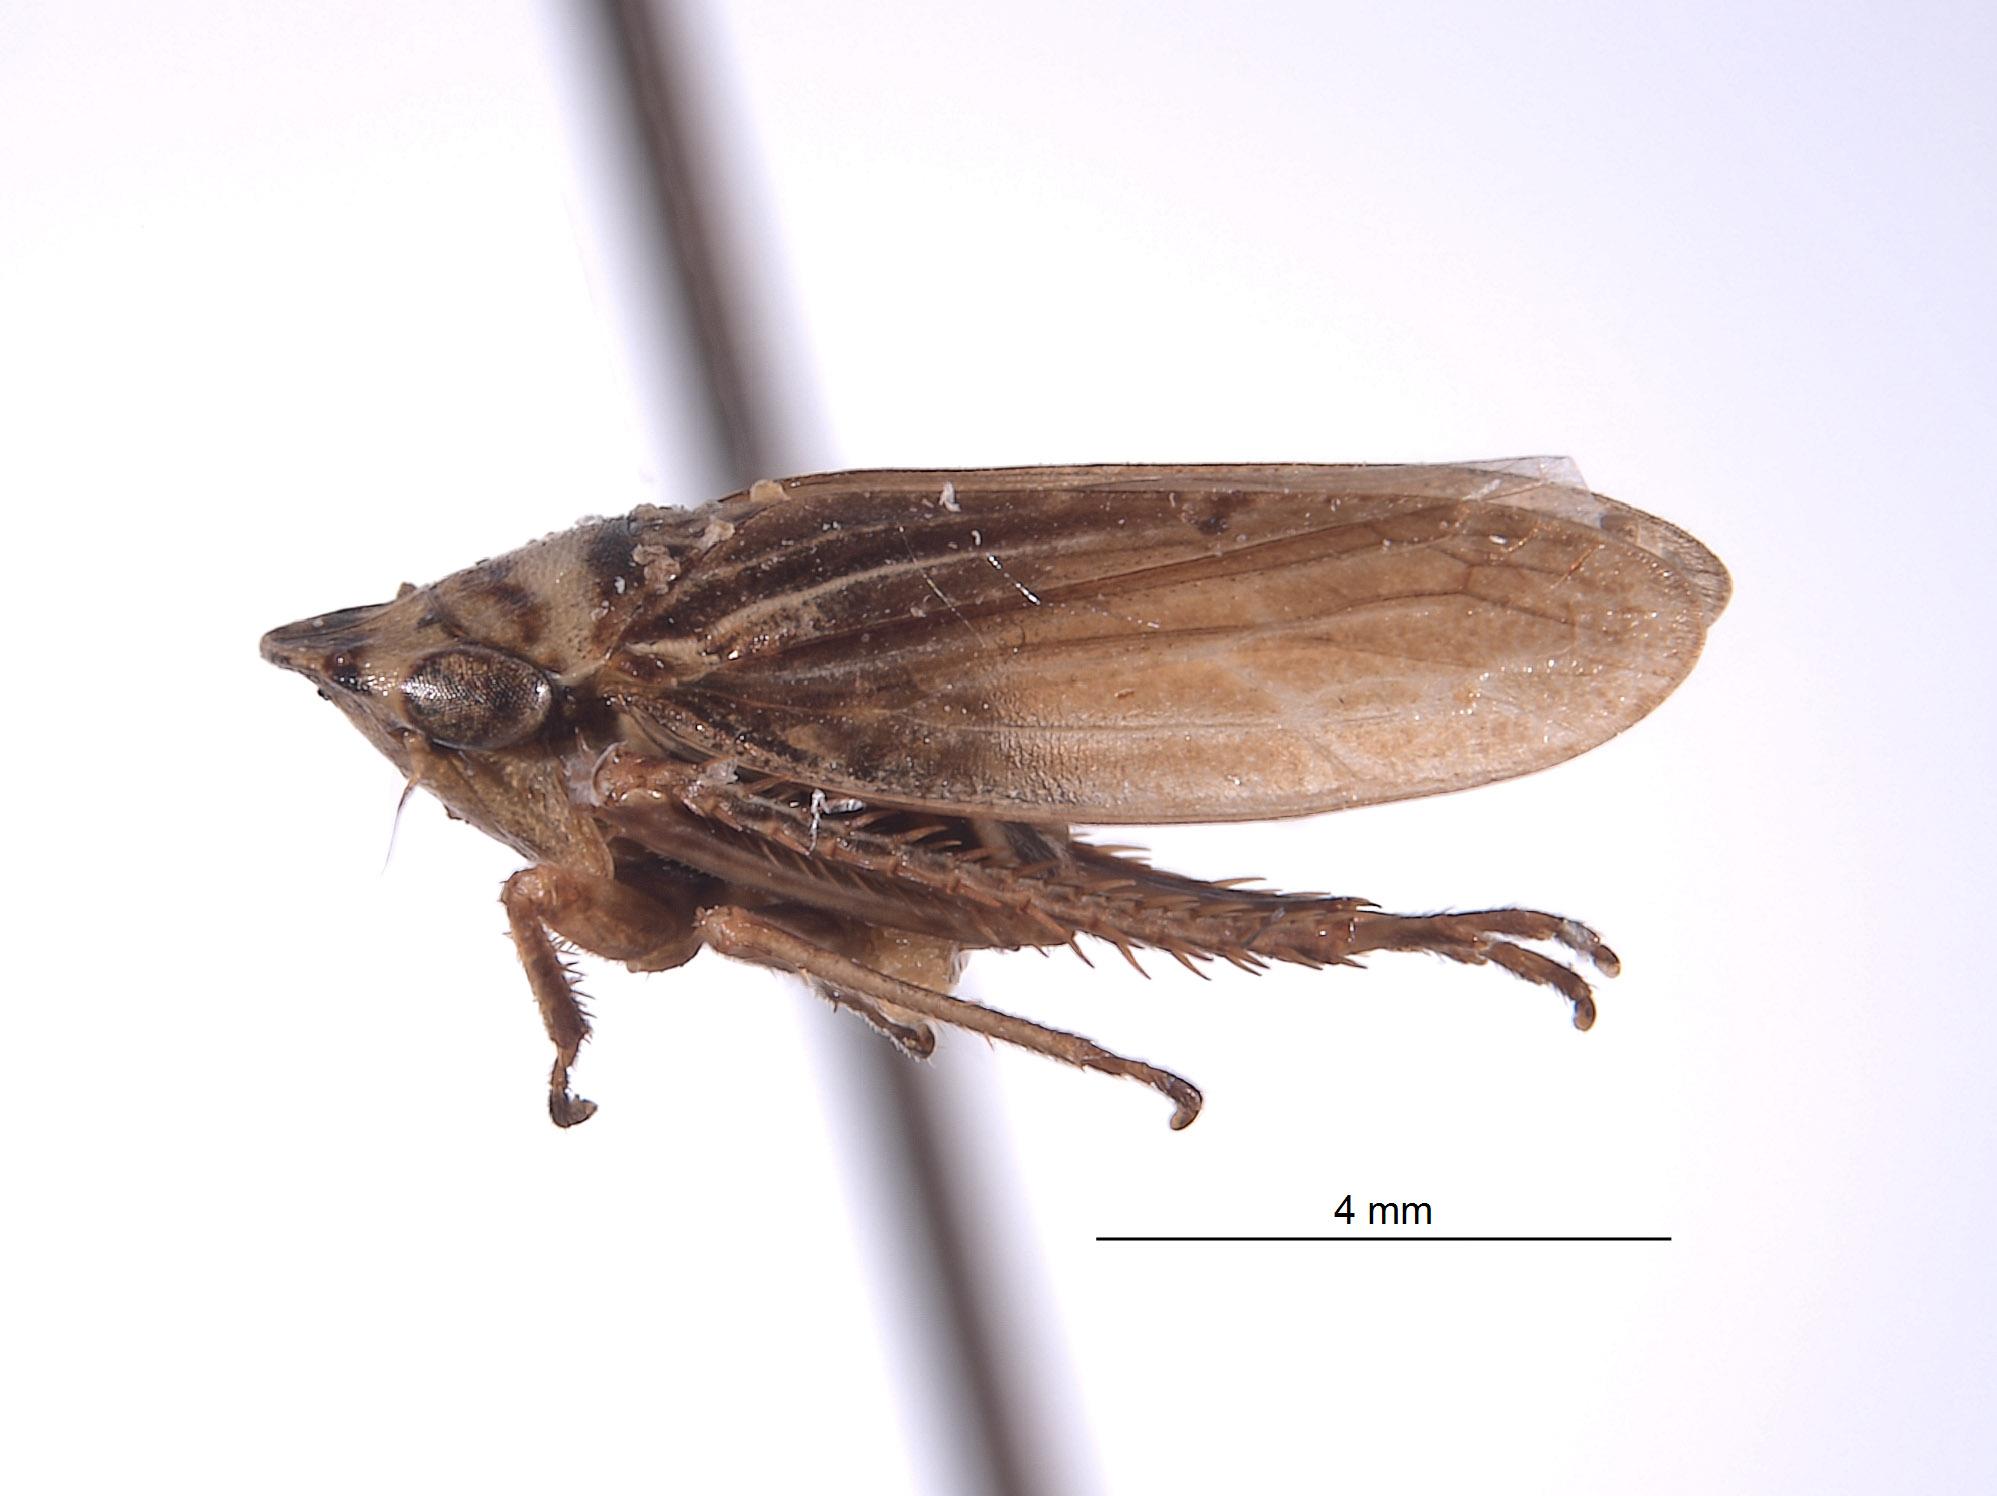 Aphrodes californiensis image